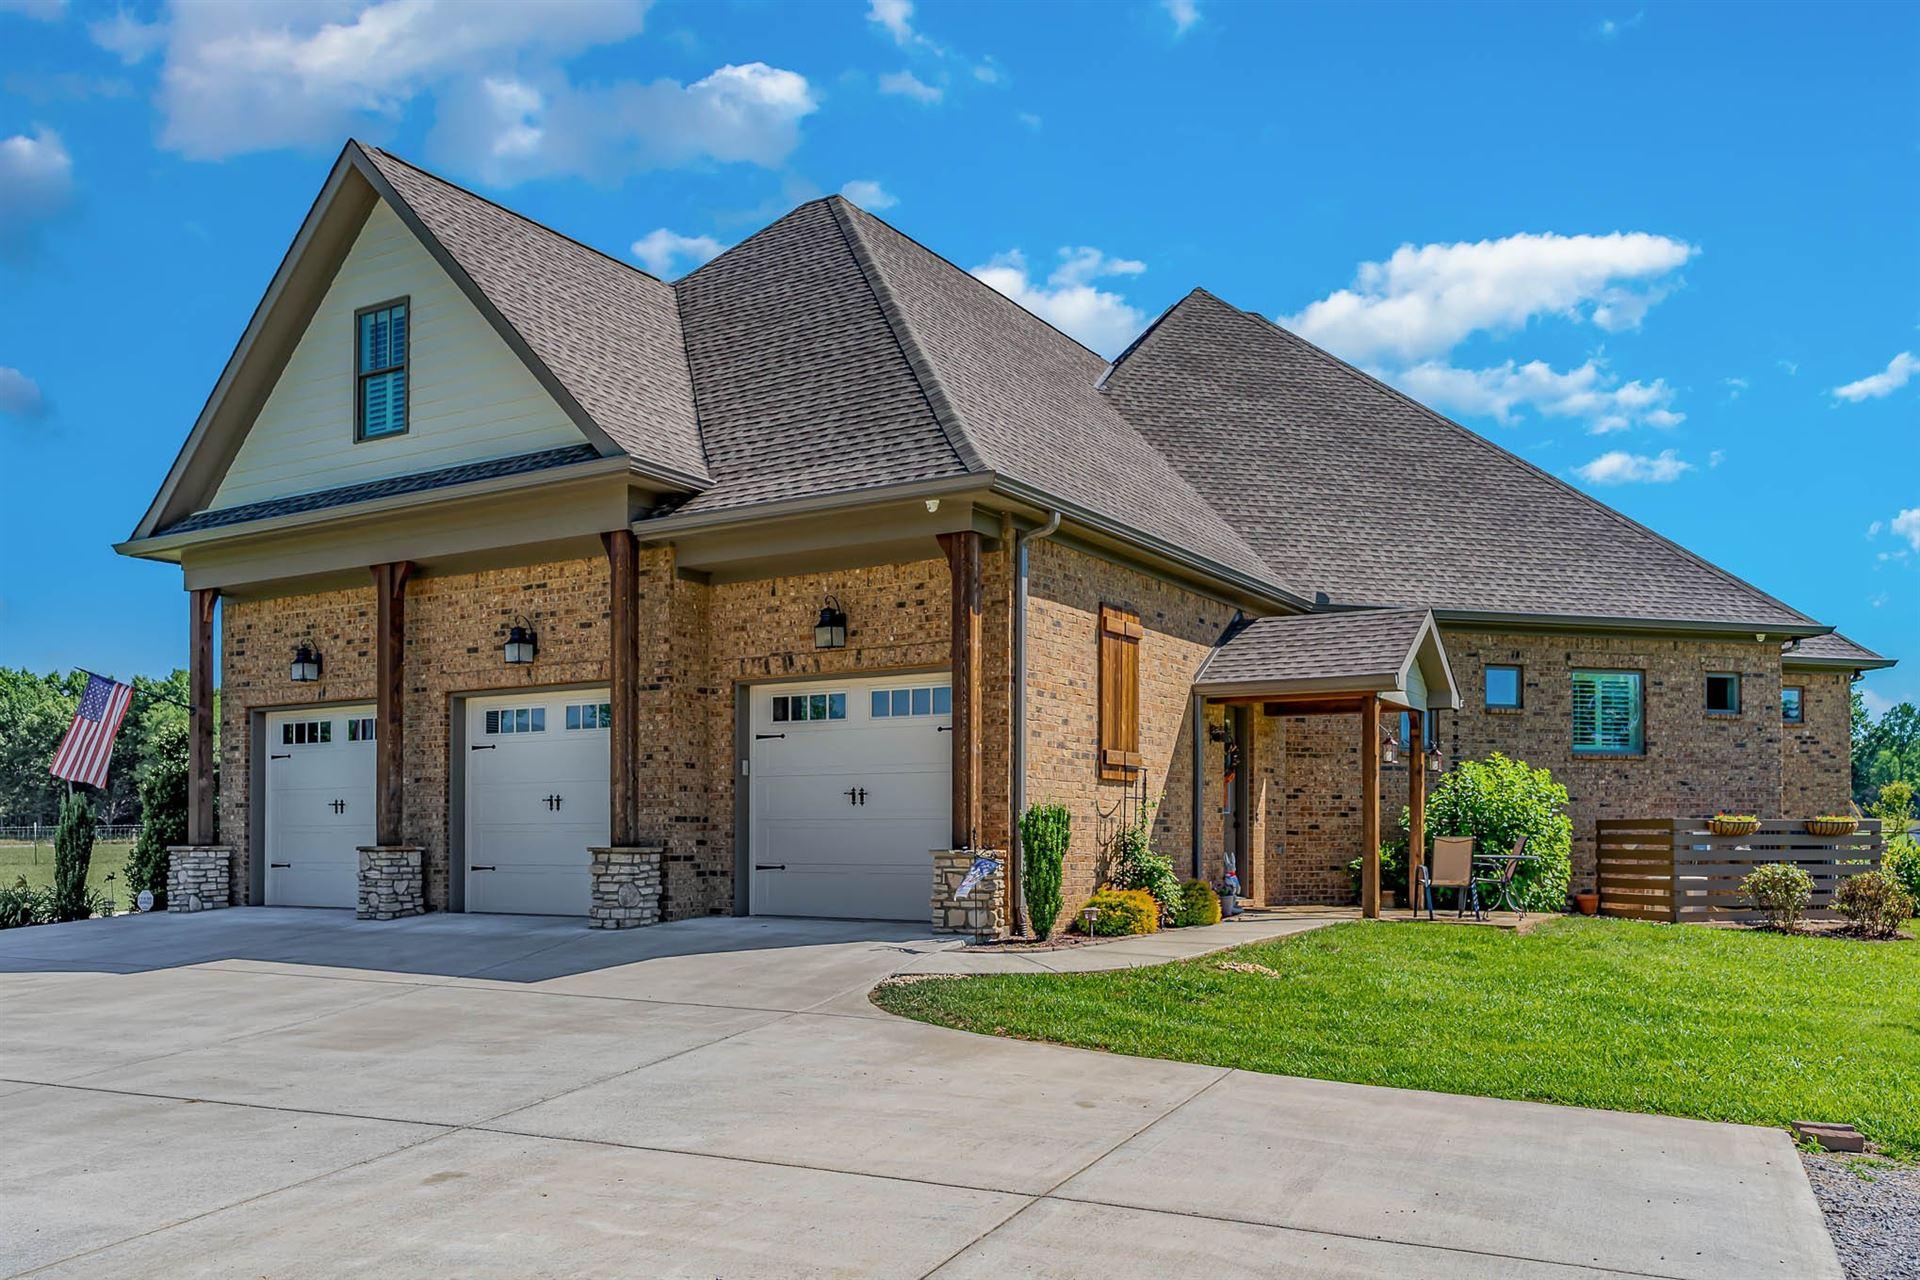 Photo of 1176 Halls Mill Rd, Unionville, TN 37180 (MLS # 2264456)